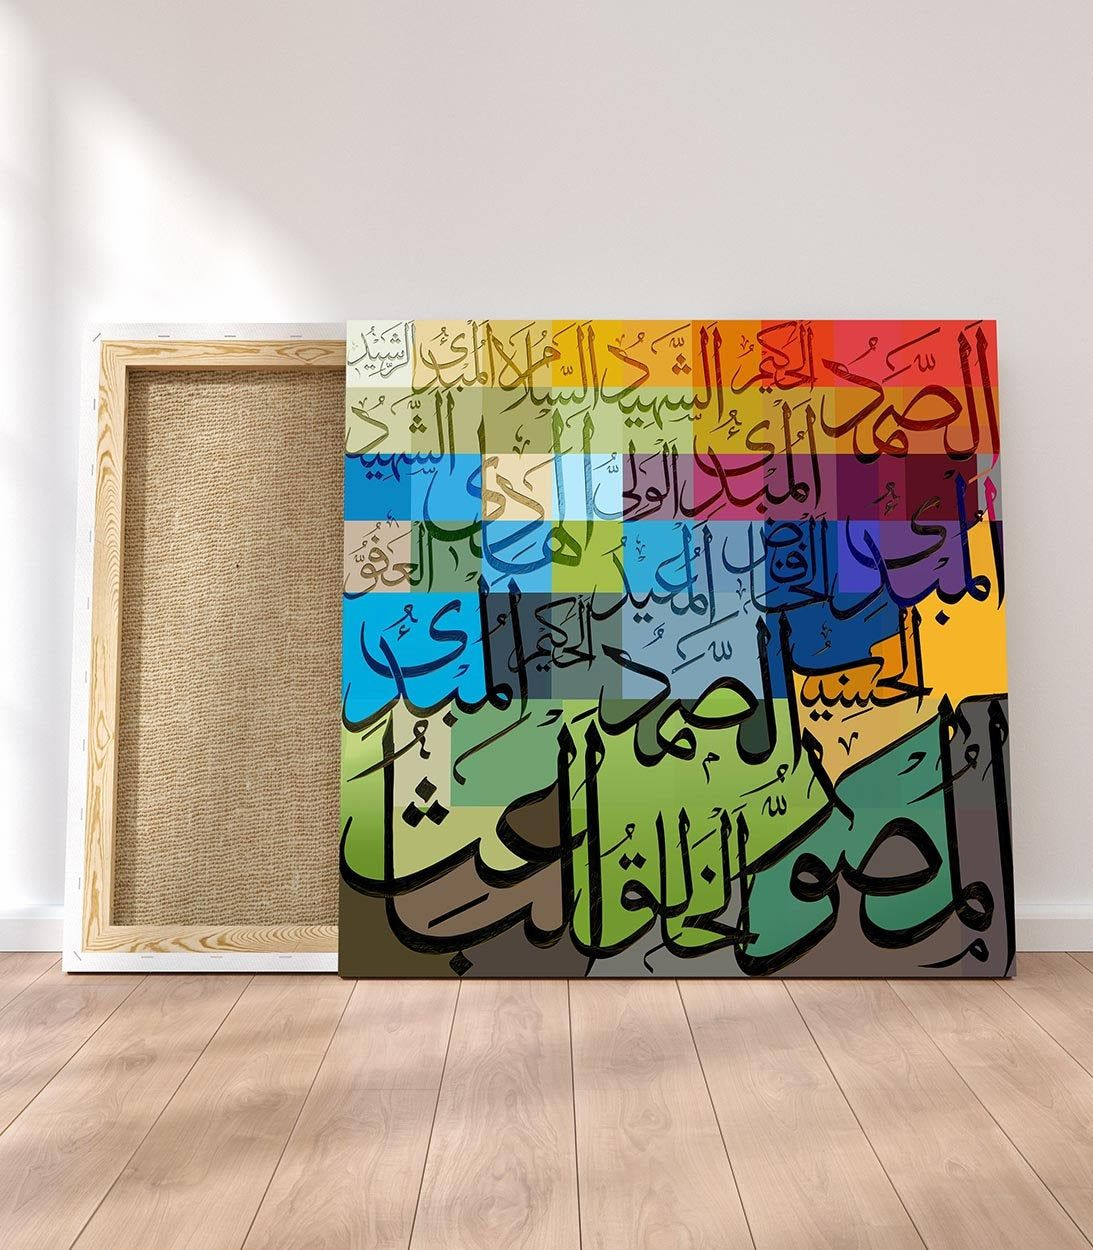 Al Asma Ul Husna Calligraphy Oil Painting Canvas Print